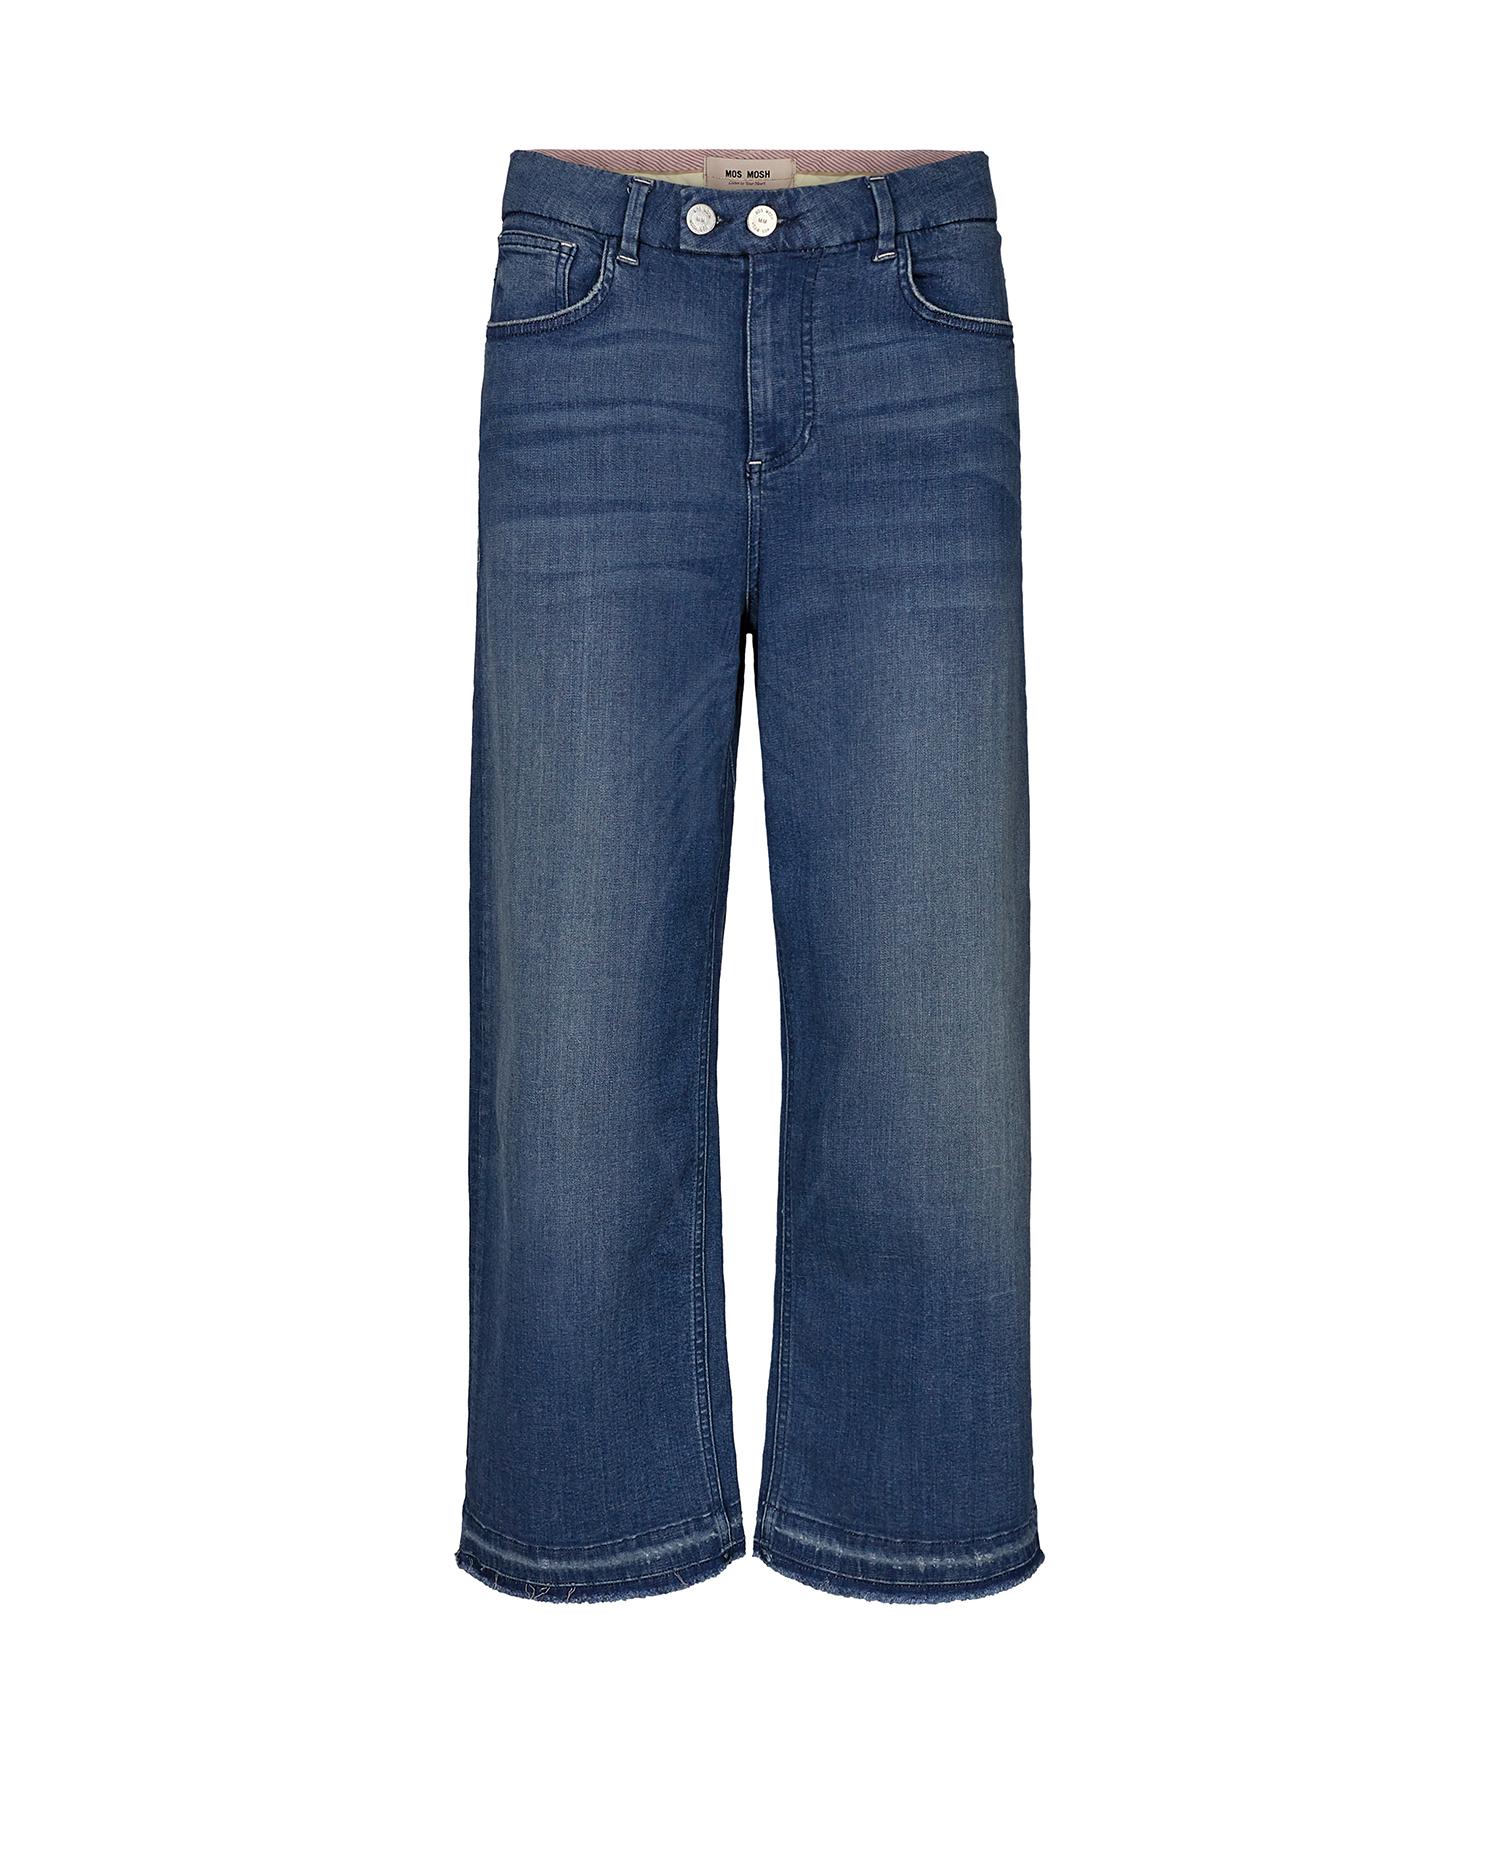 Bailey Rich Jeans